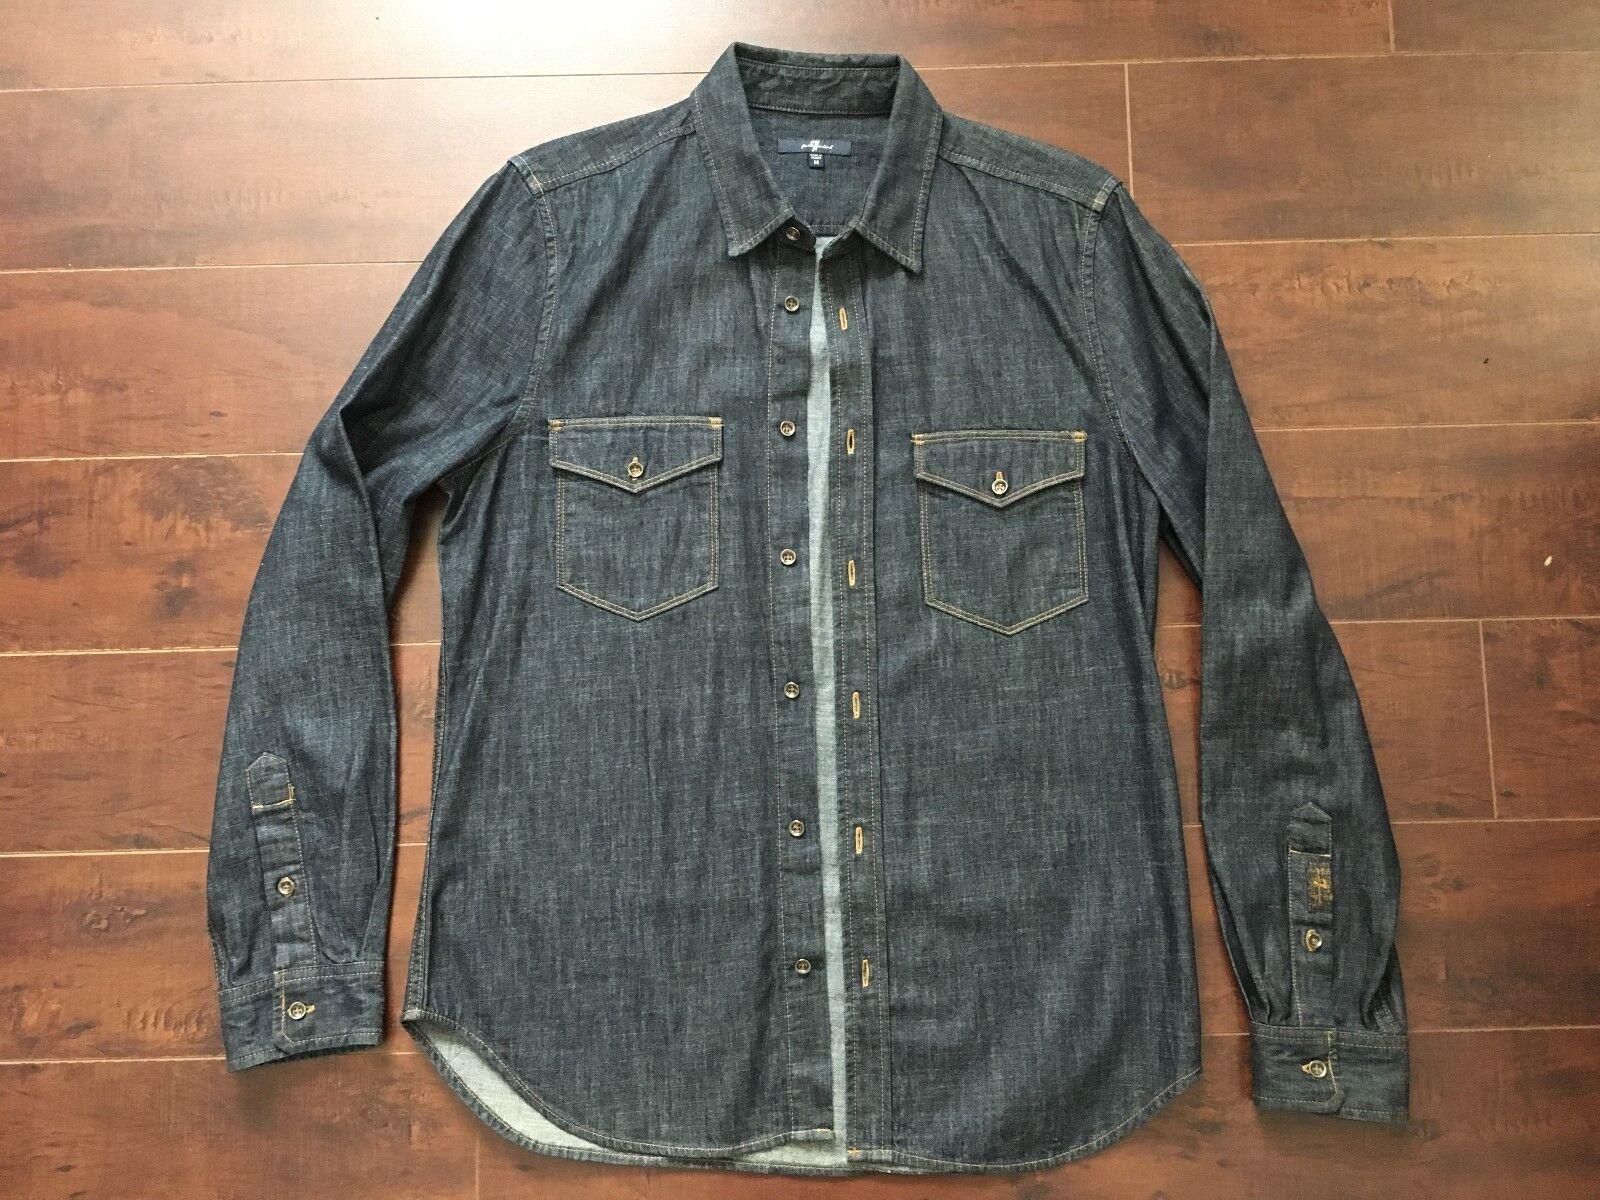 NWOT 7 for All Mankind Men's Slim Fit Denim Shirt – M